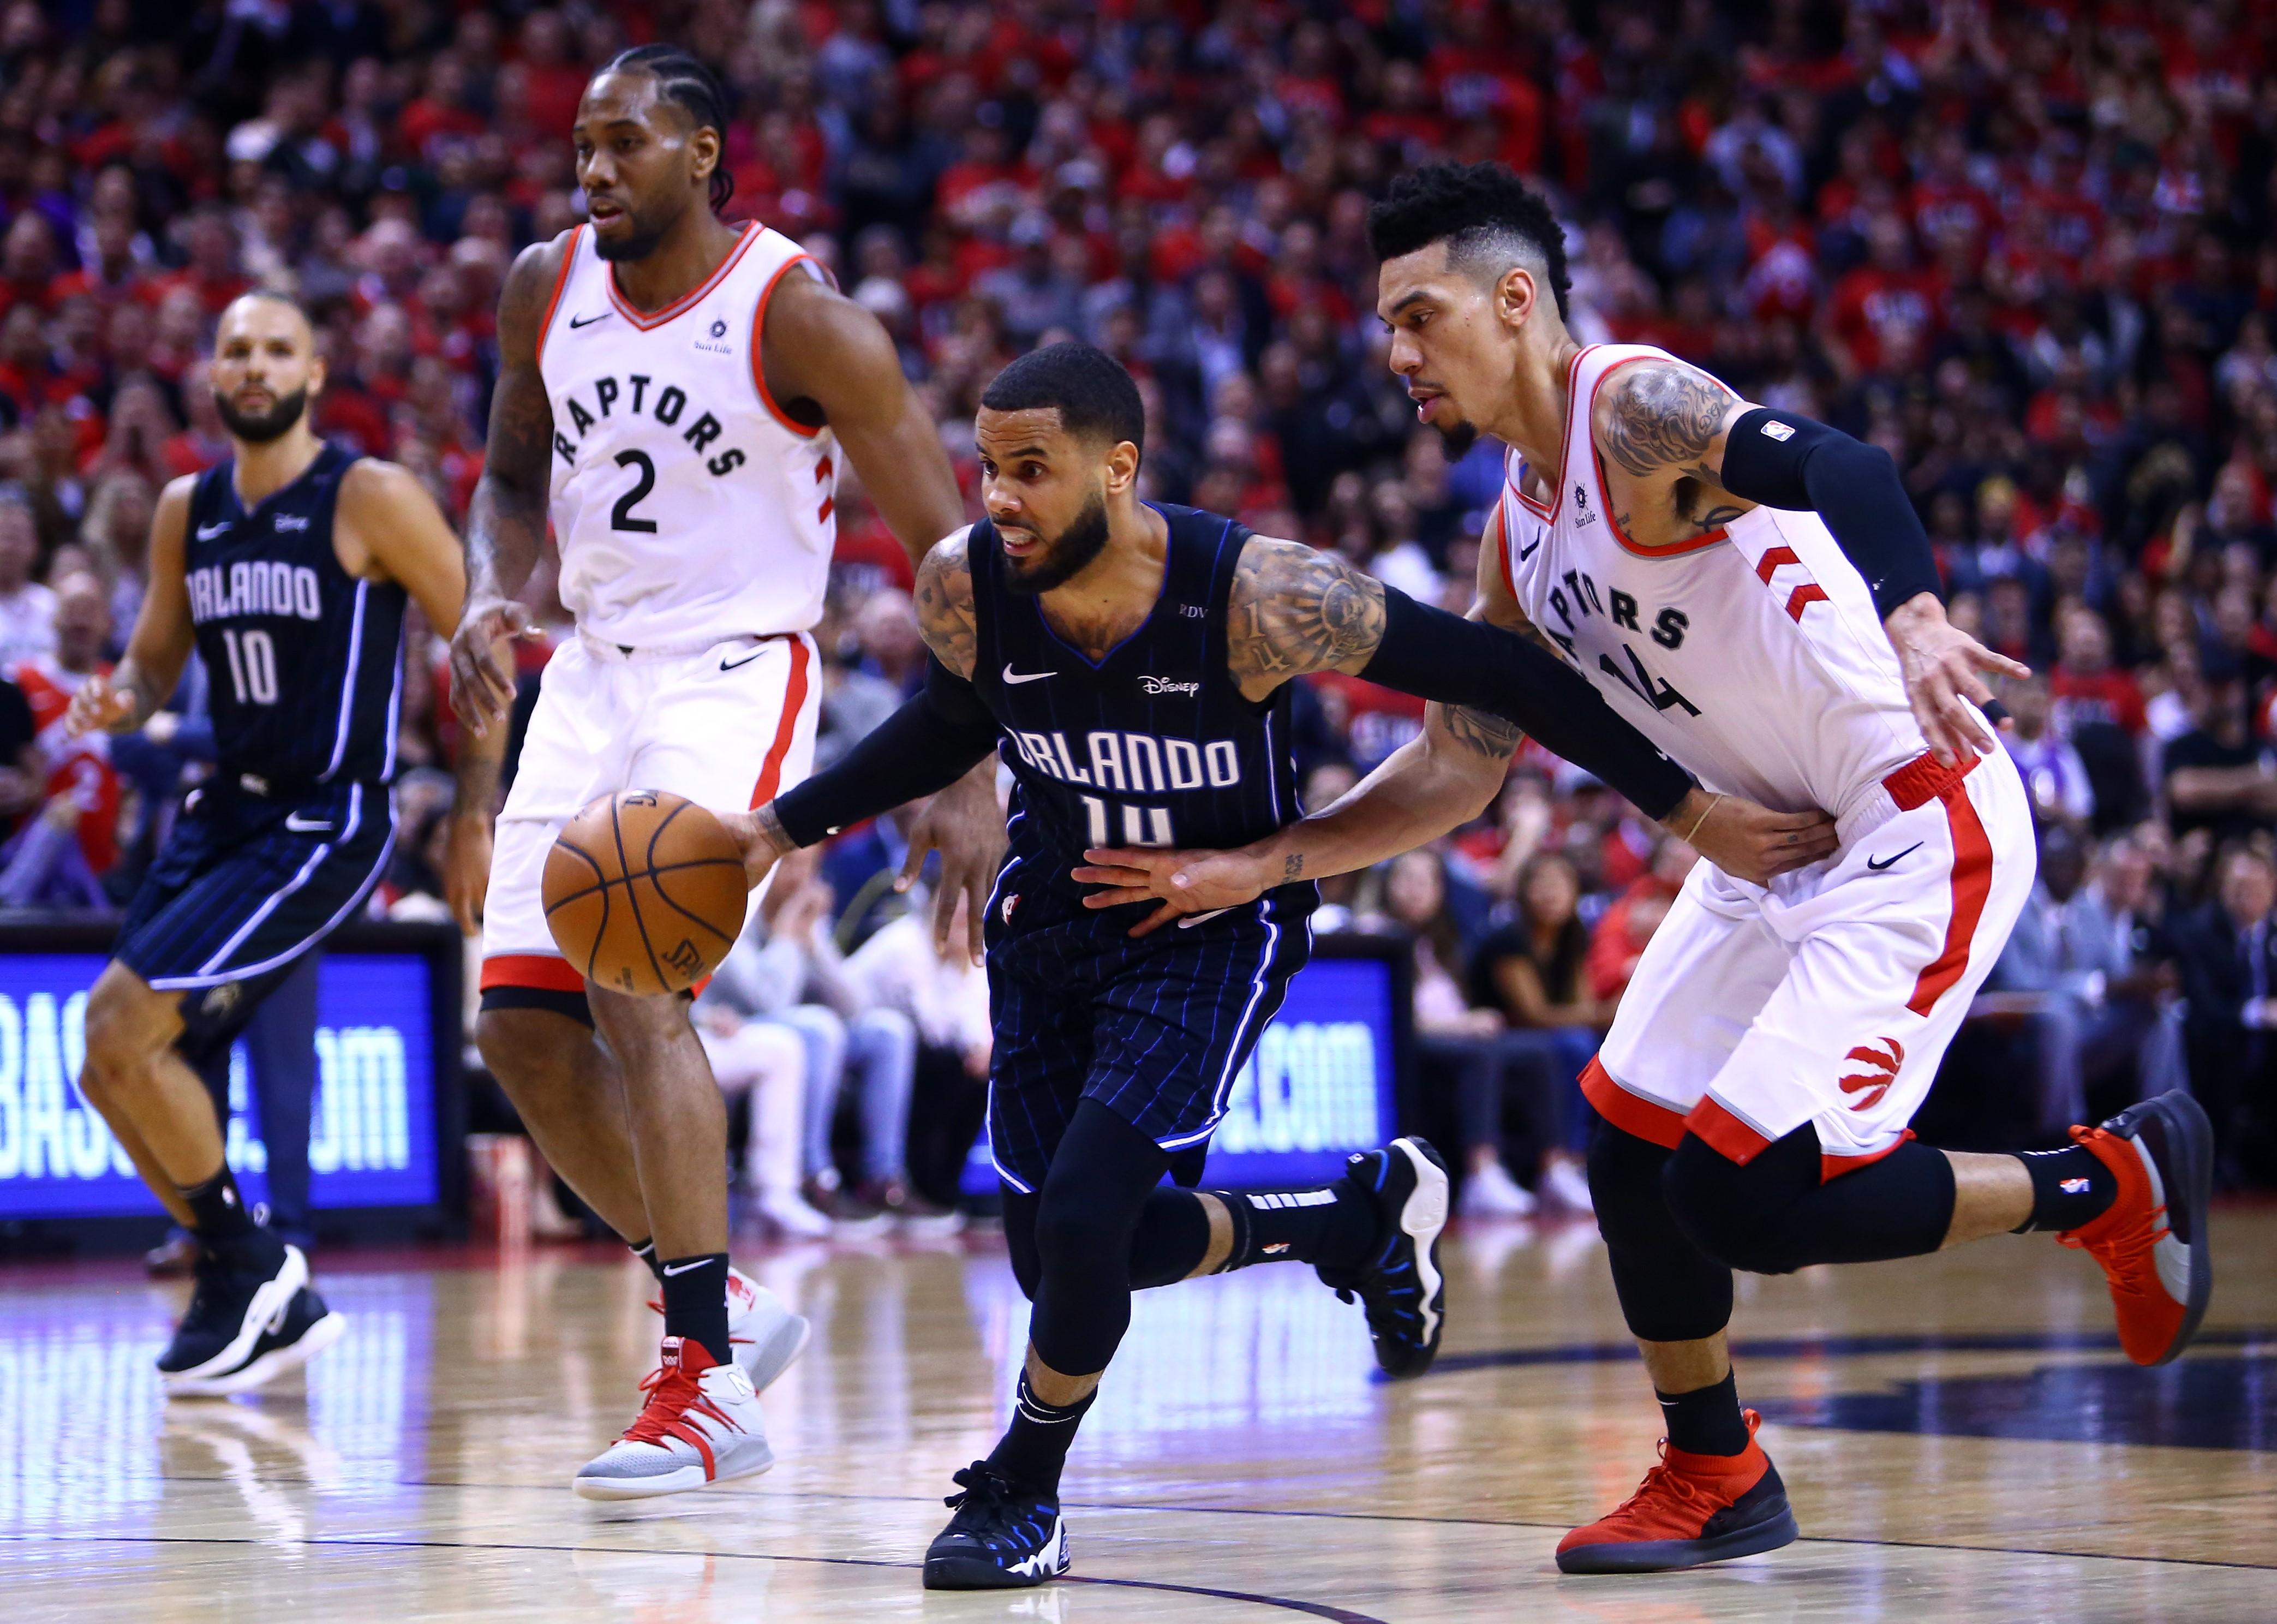 Augustin, Orlando Magic @ Toronto Raptors